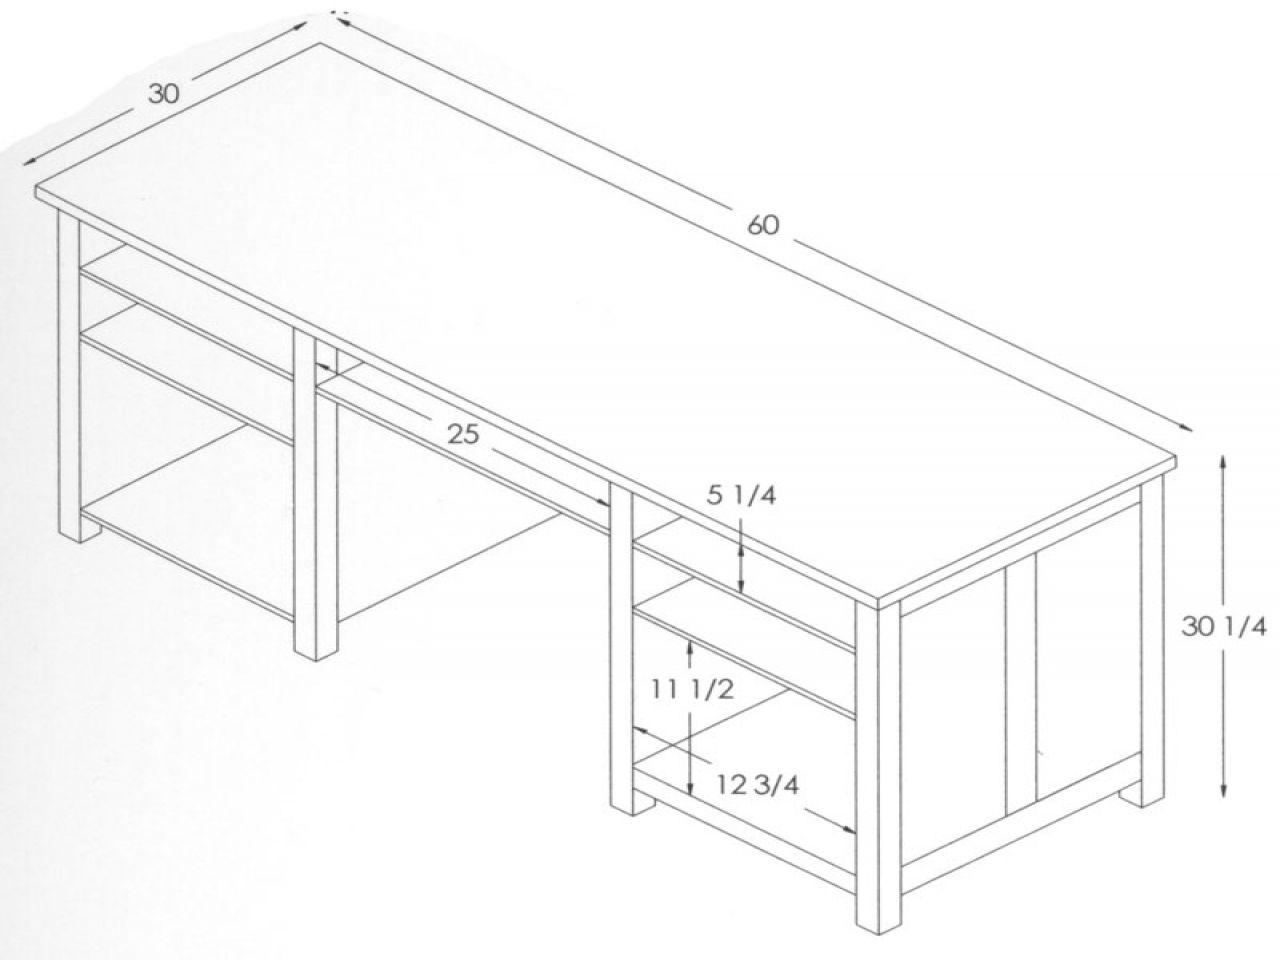 office desk sizes standard furniture ideas pinterest office rh pinterest com standard disk sizes standard deck size